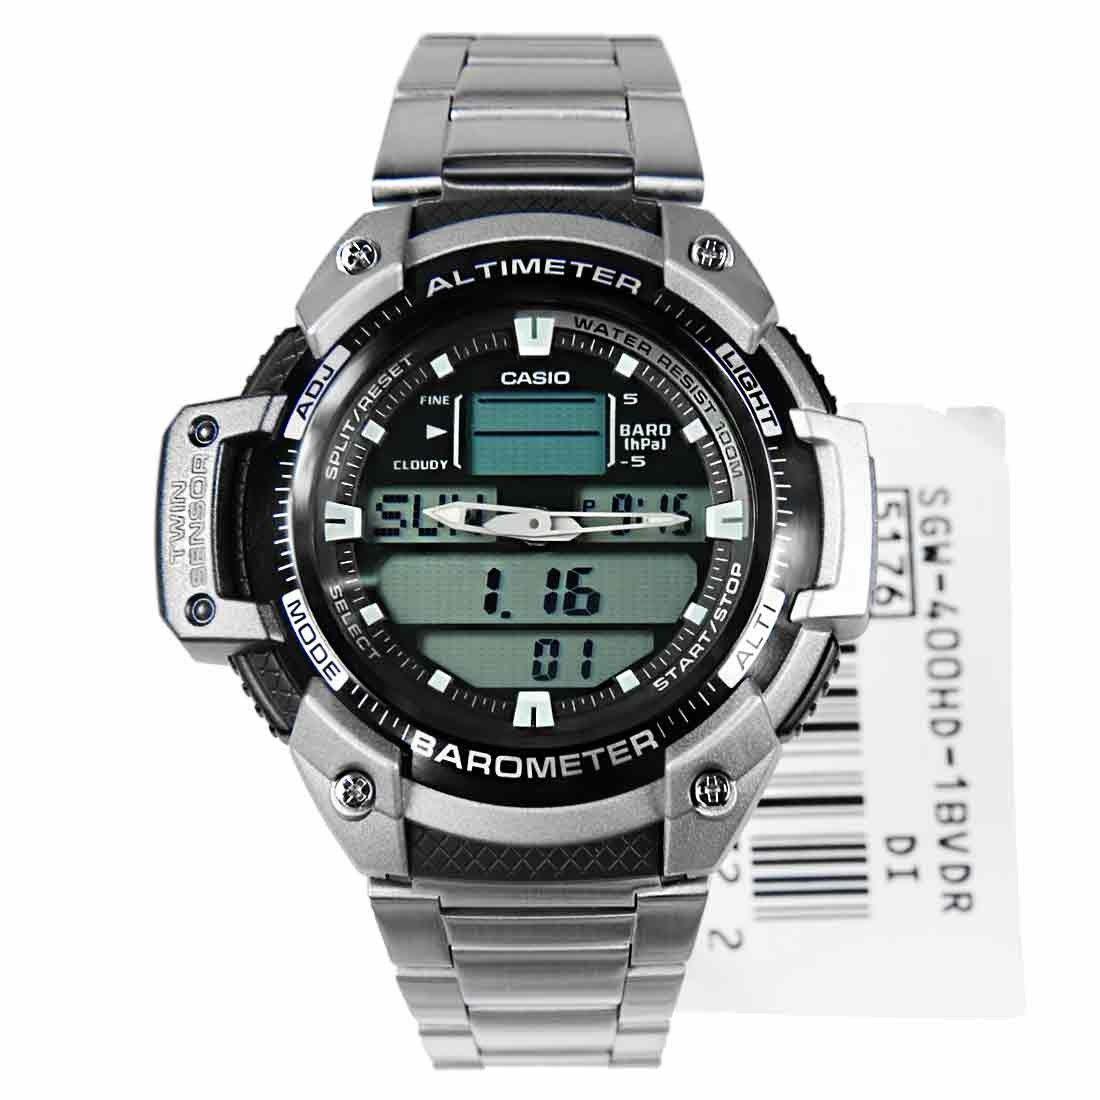 Relógio Casio Out Gear SGW-400HD - Altímetro e Barômetro  - MGPesca